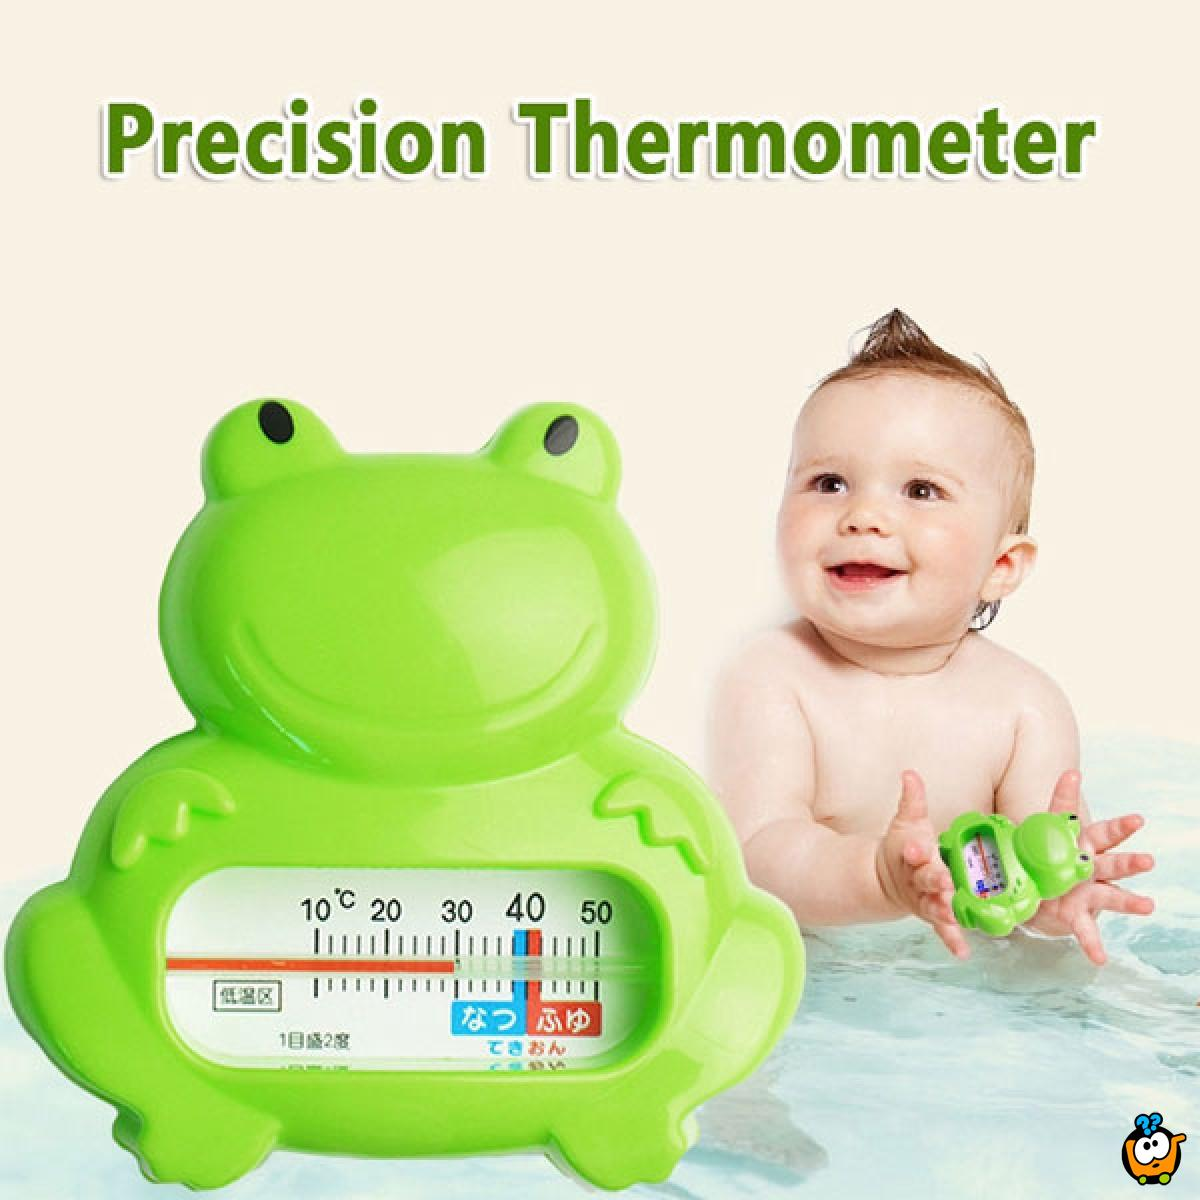 Termometar za vodu u obliku žabice